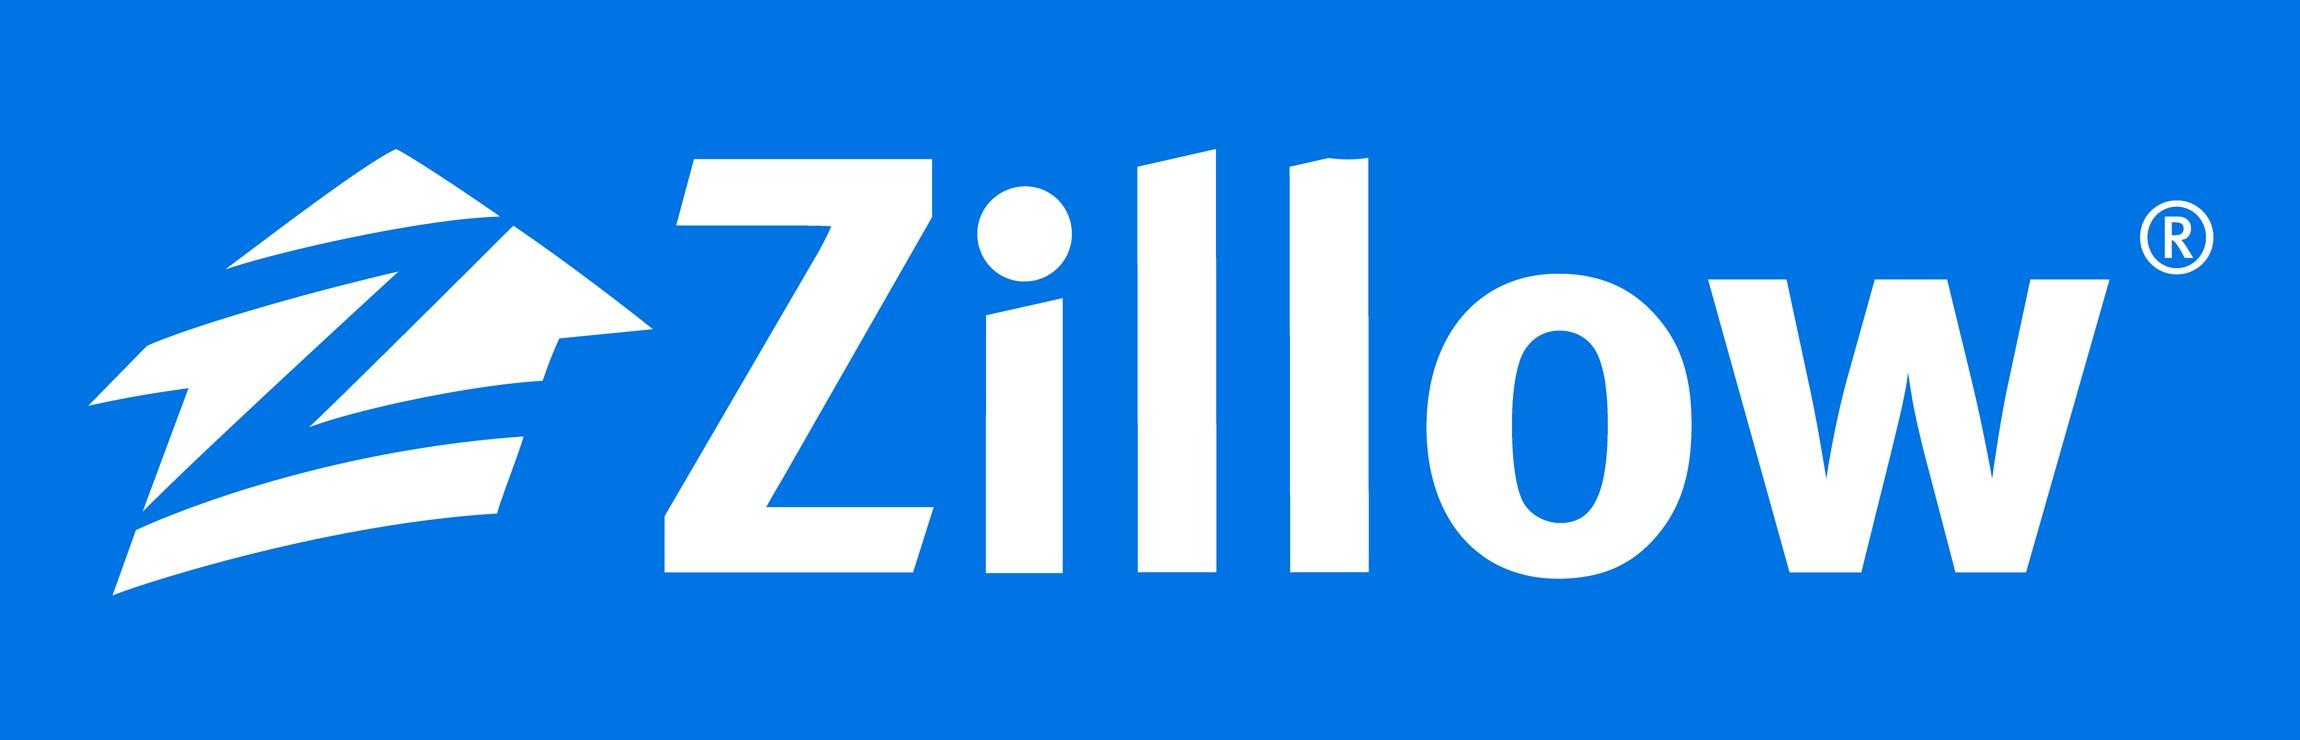 Color-Zillow-Logo.jpg